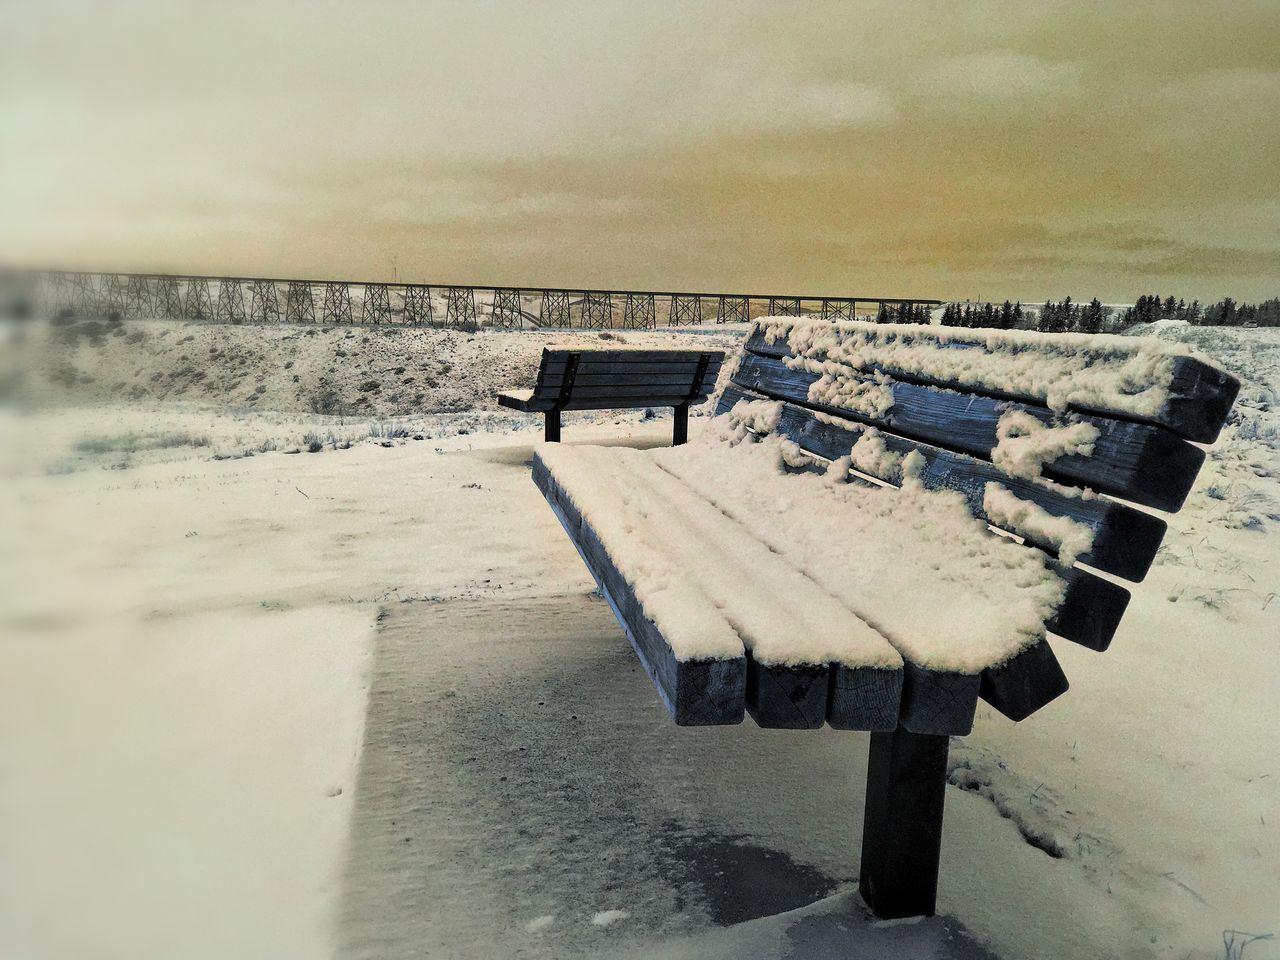 IPhoneography Januaryphotochallenge Showcase: January Bench Overlooking Coulees Train Trestle Bridge Iphonephotography IPhone Photography Iphonephotoacademy IPS2016Winter